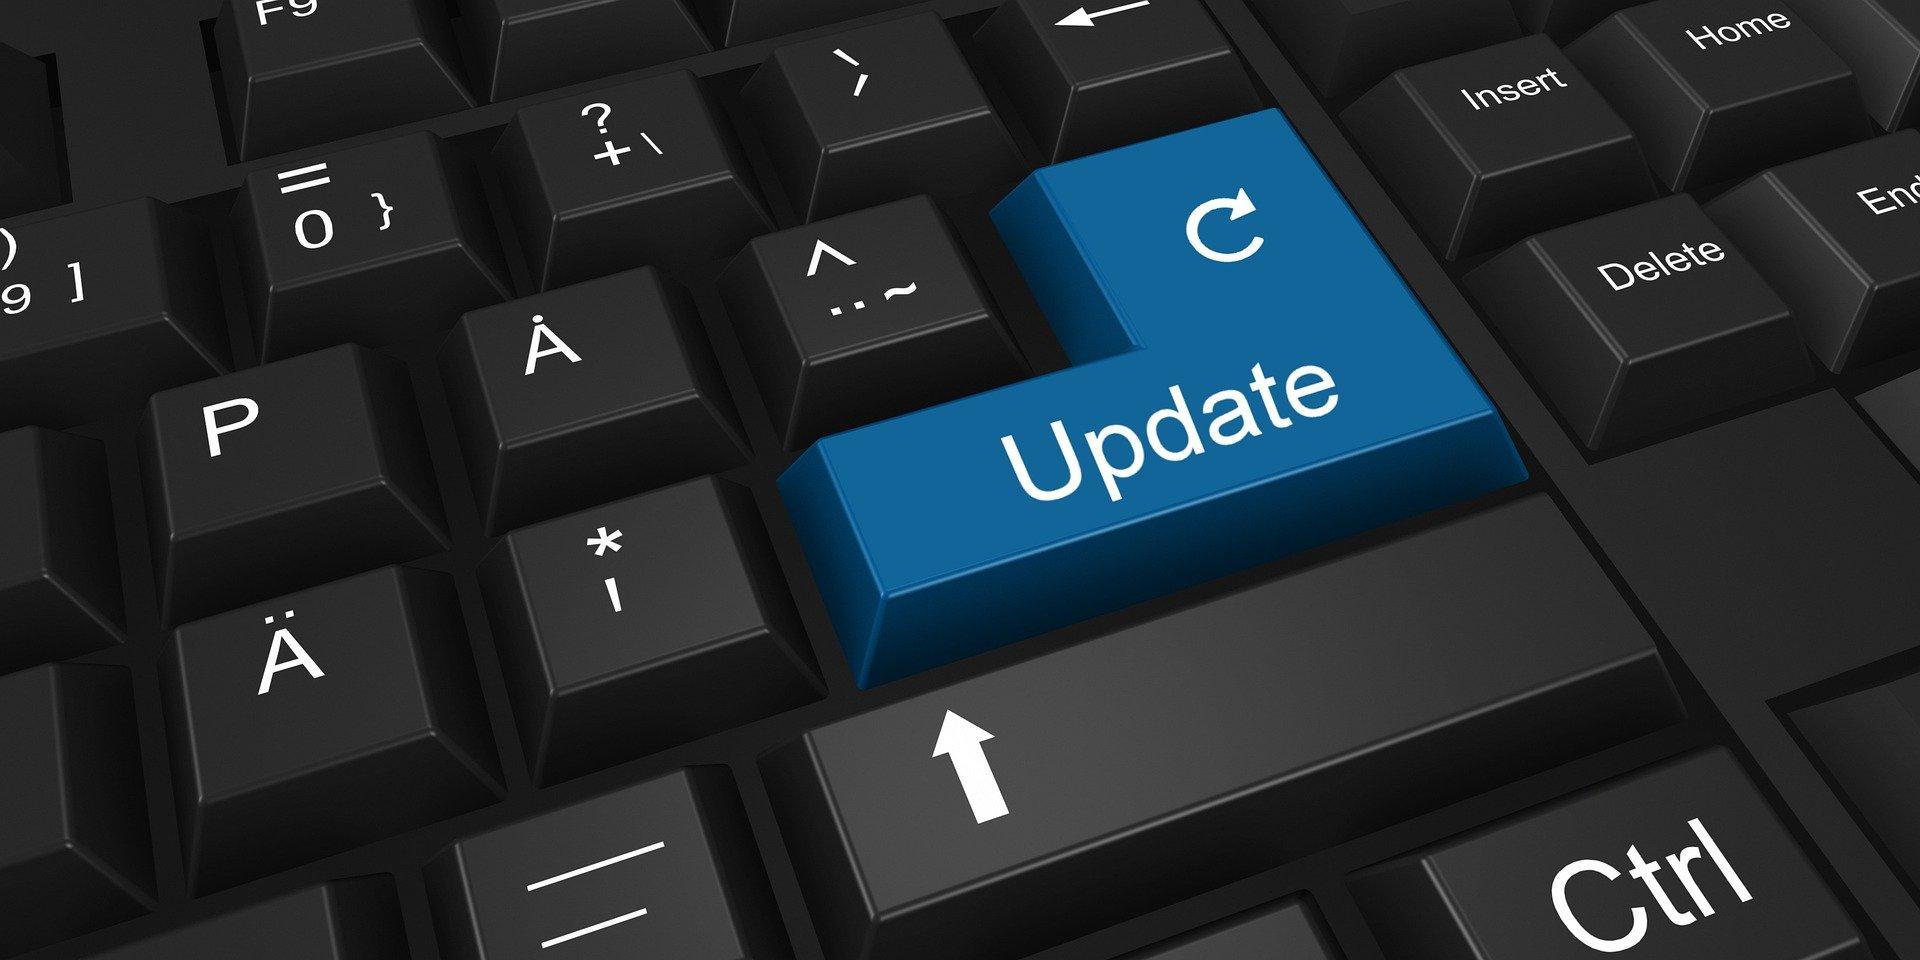 update-g0ca5c358c_1920